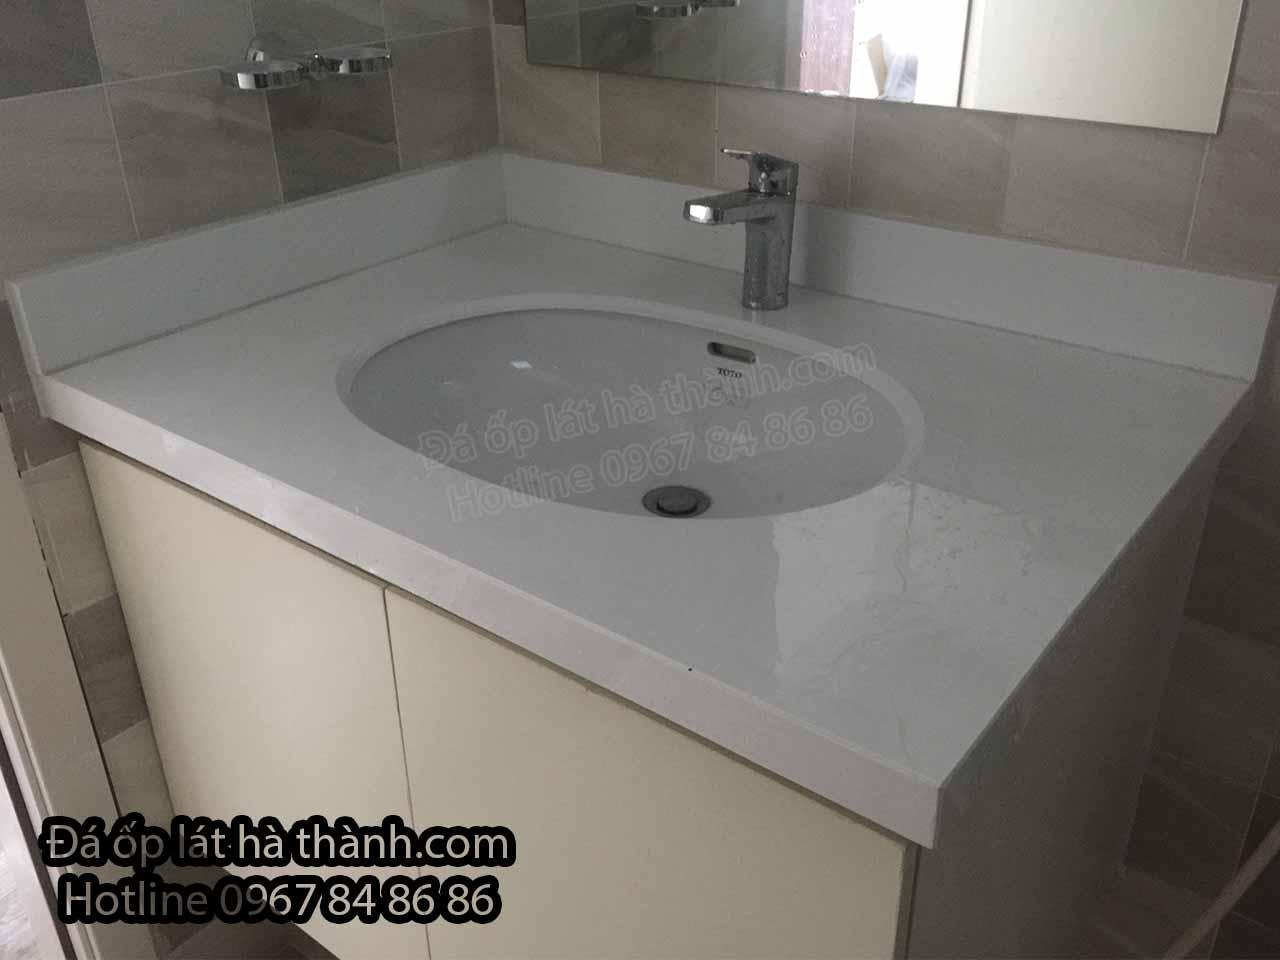 da-nhan-tao-vicosrone-op-lavabo